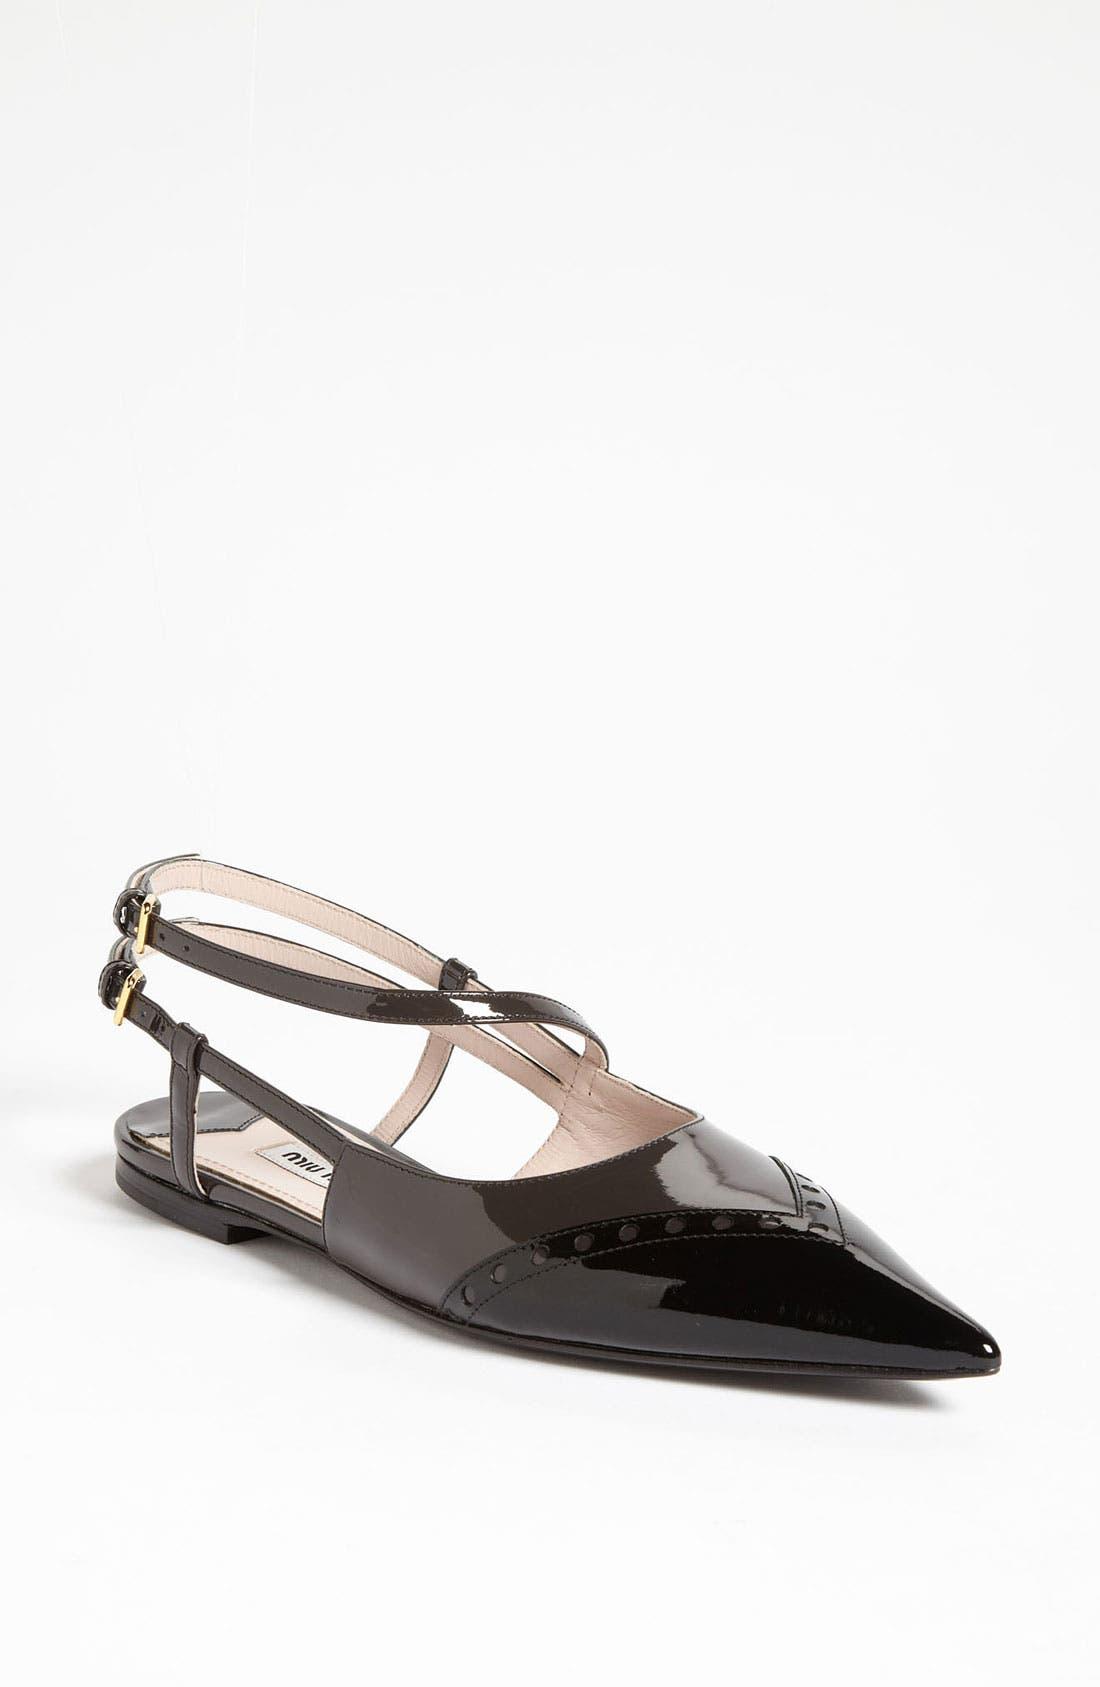 Main Image - Miu Miu Pointed Toe Ballet Flat (Nordstrom Exclusive)